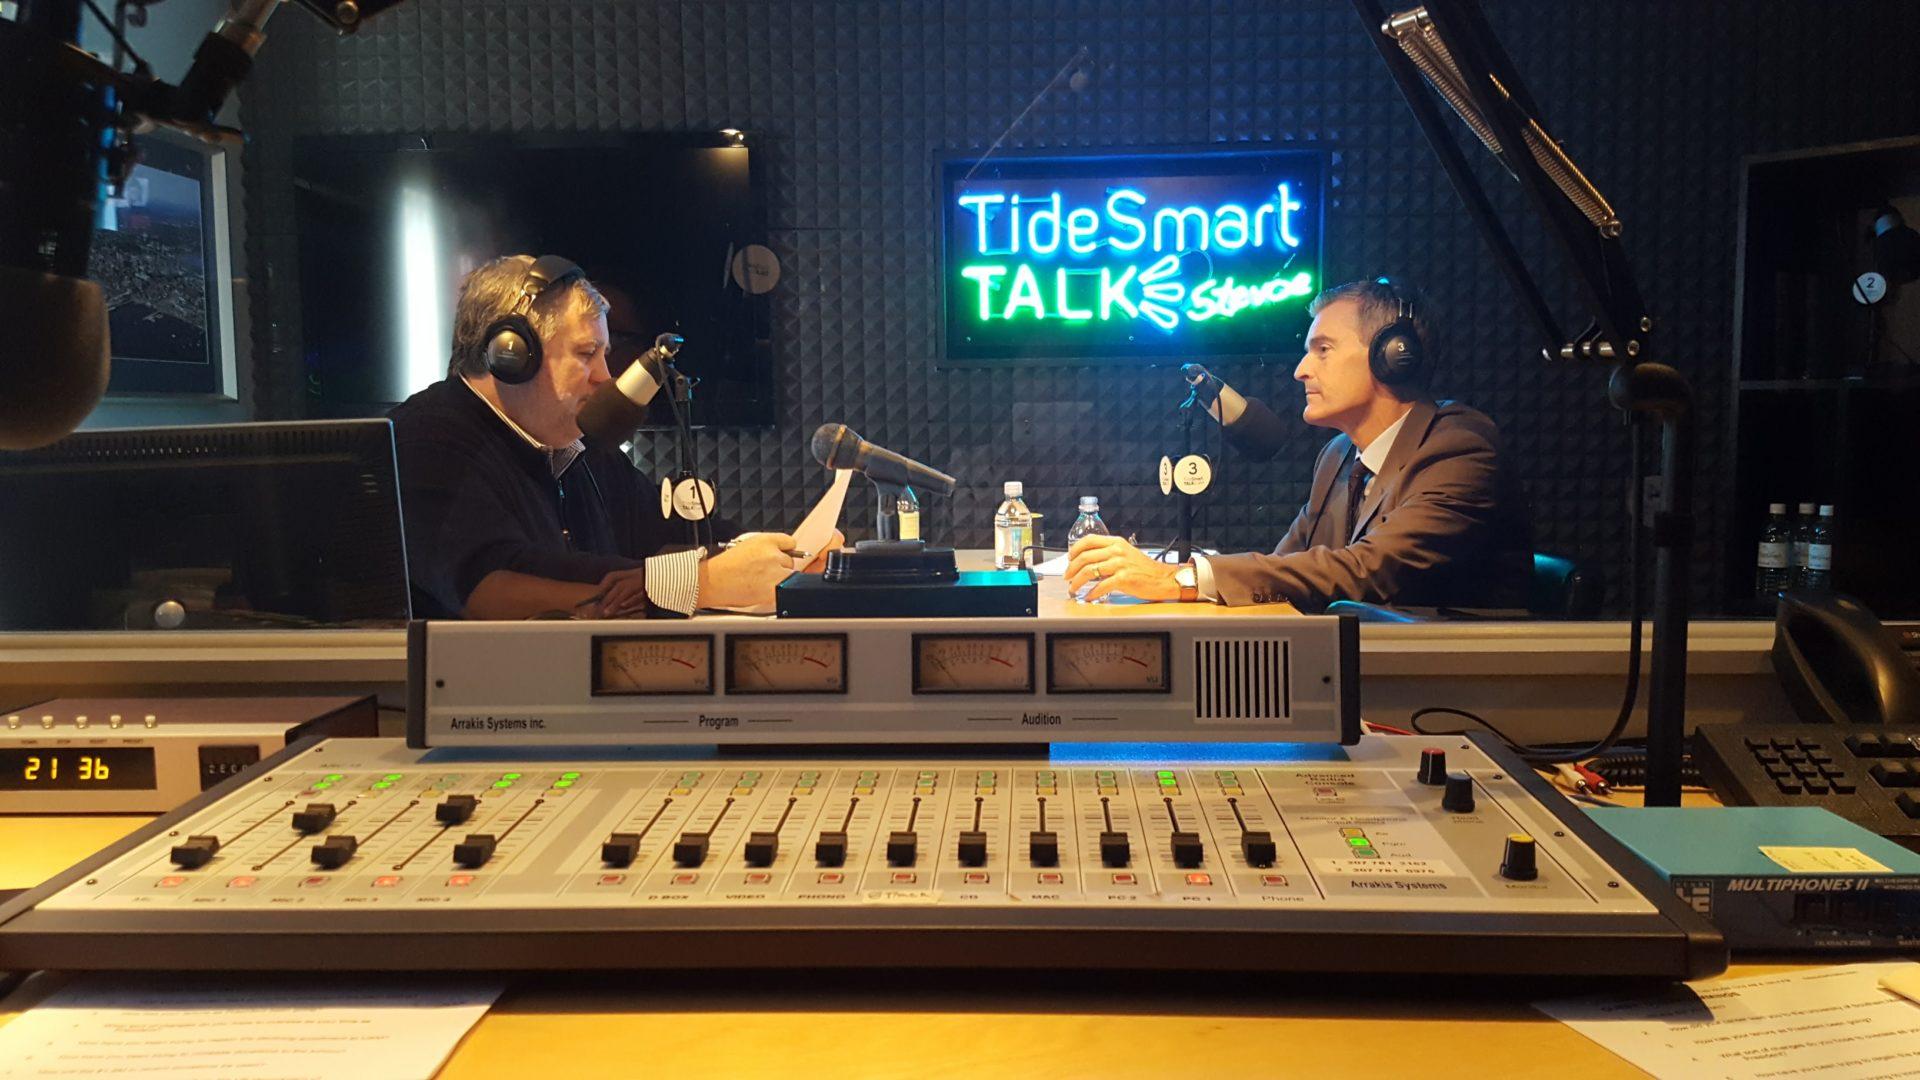 Host of TideSmart Talk with Stevoe, Steve Woods, welcomed President of the University of Southern Maine, Dr. Glenn Cummings  (at right).